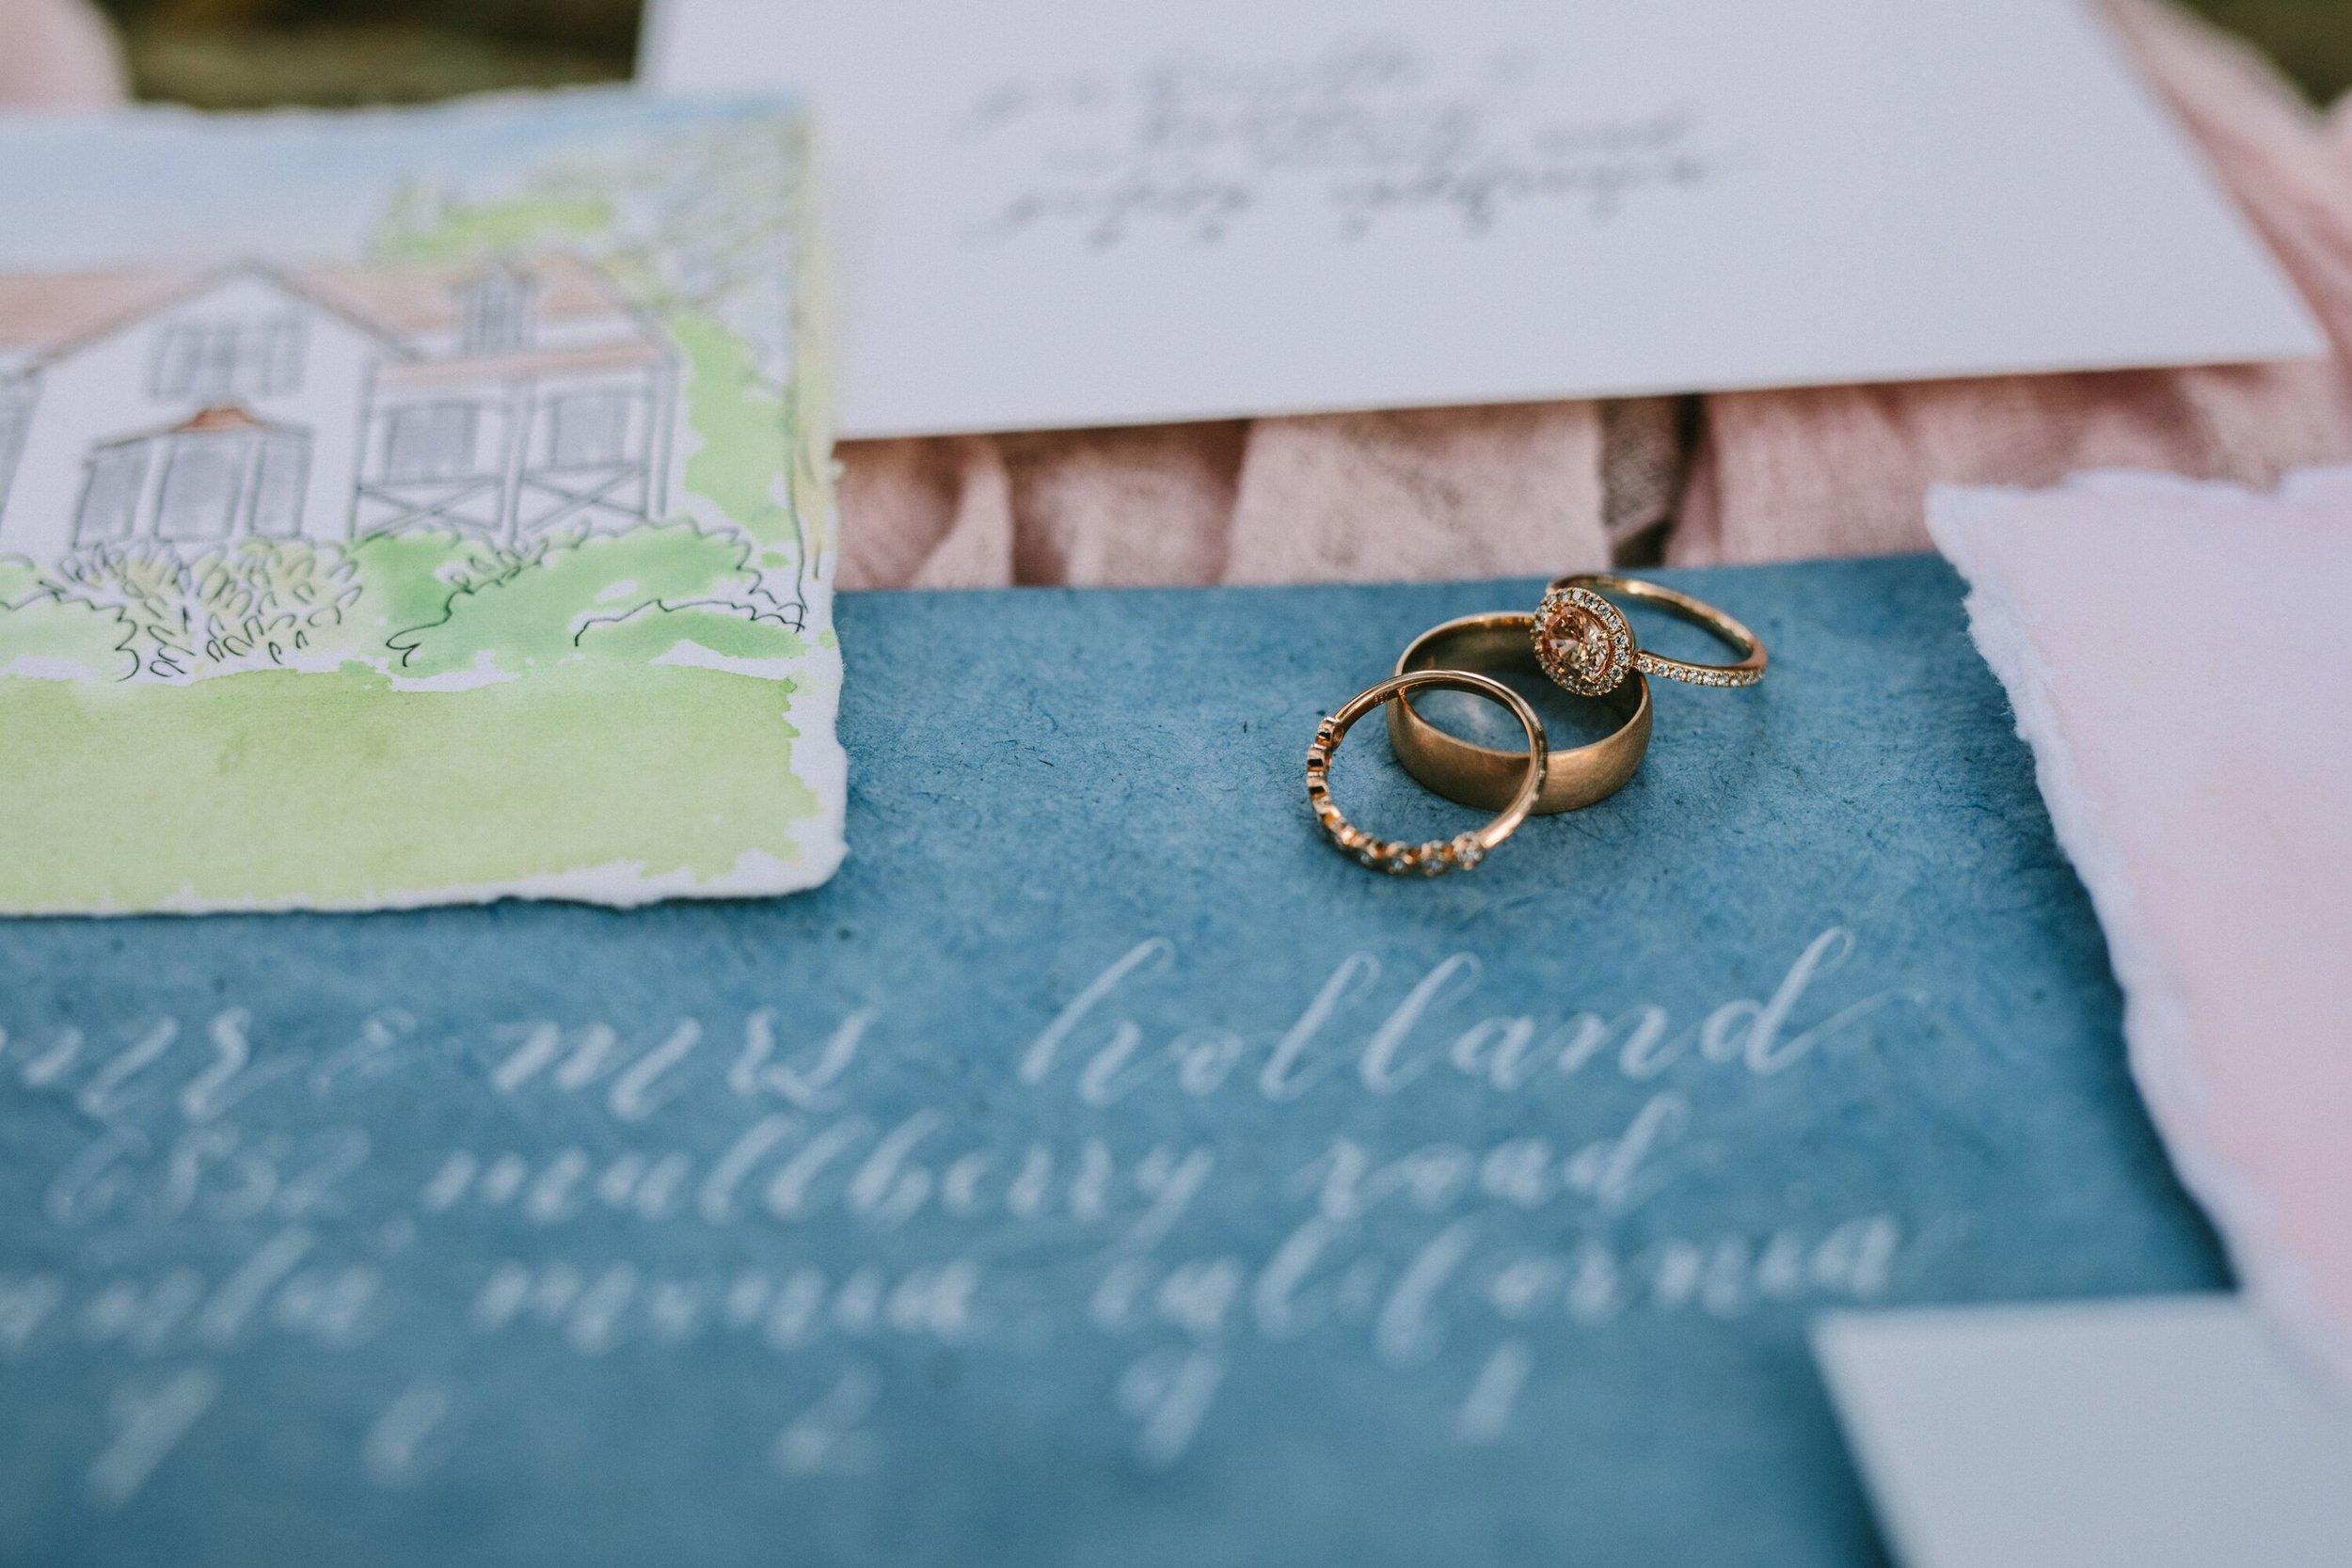 www.santabarbarawedding.com | Photographer: Patrick Ang | Venue: Rancho La Patera & Stow House | Wedding Planner: Elyse Rowen of Elyse Events | Rings - Detail